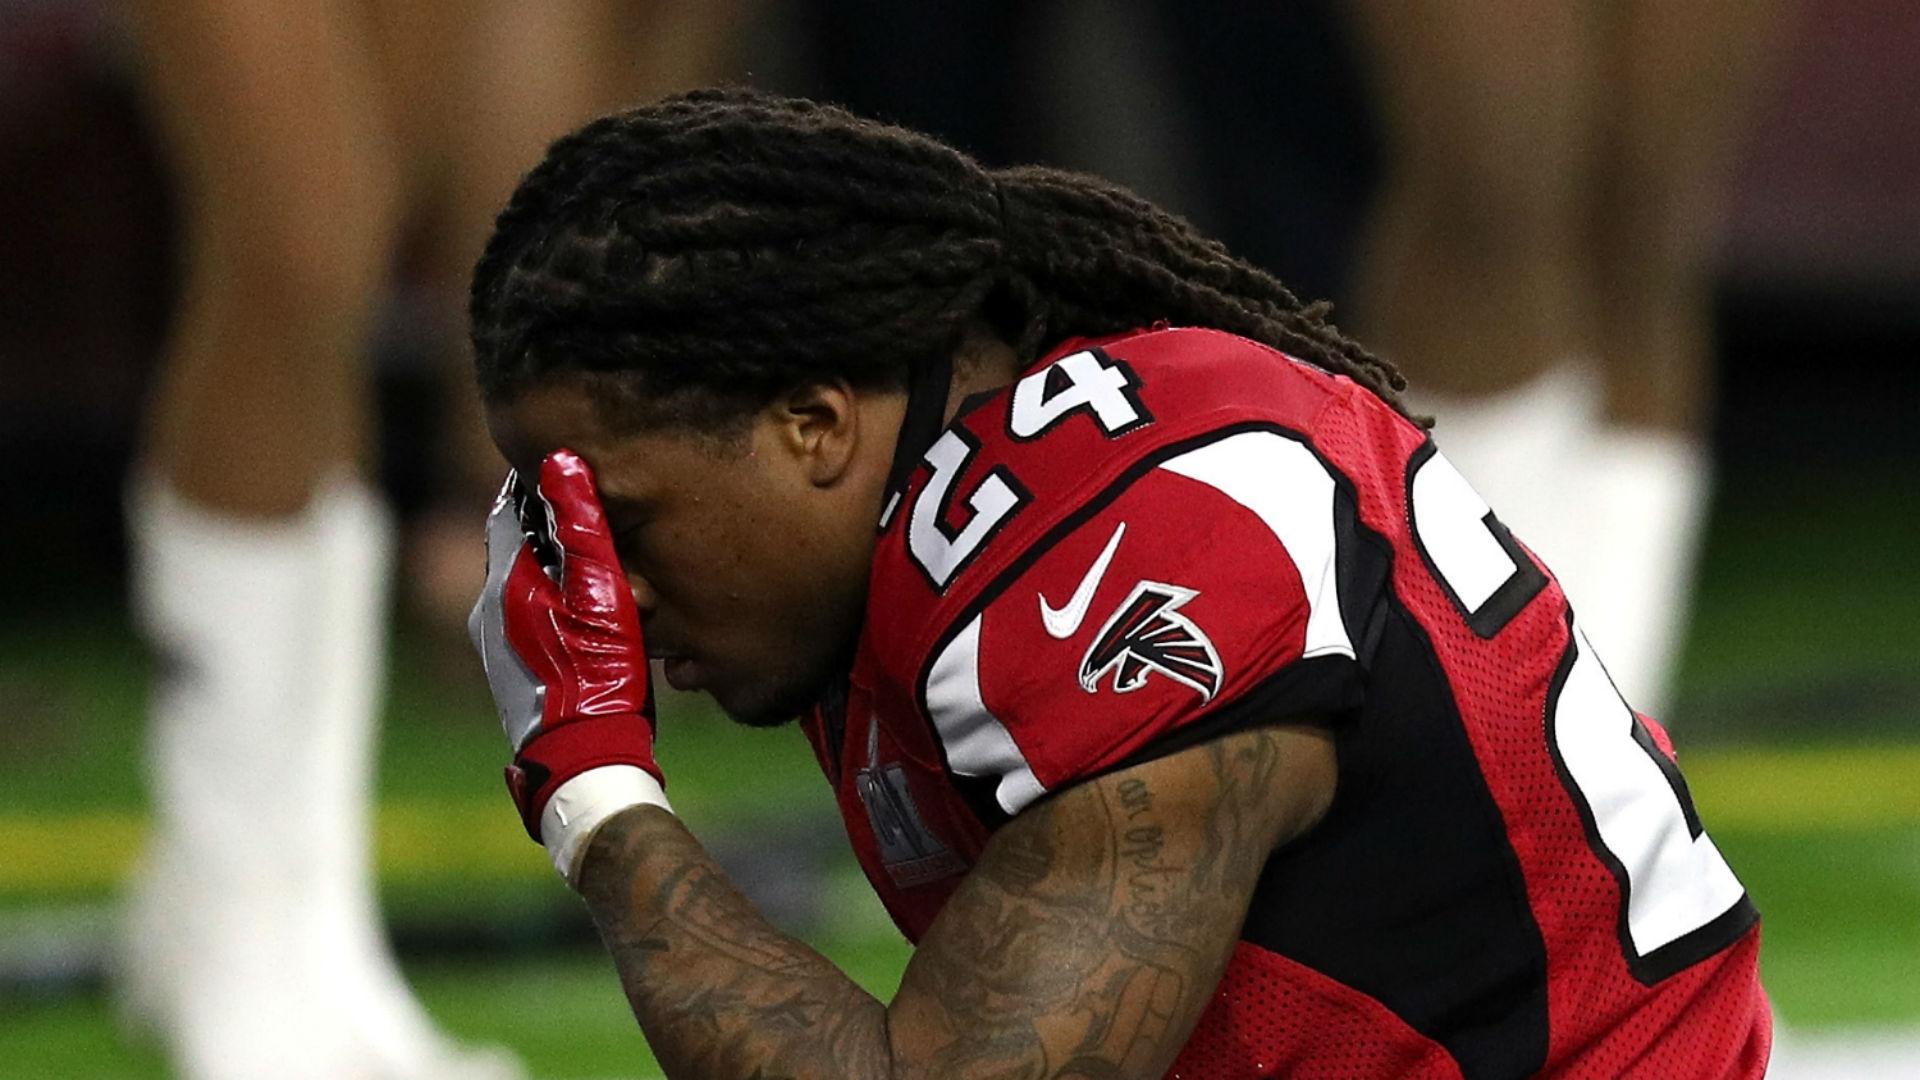 Devonta Freeman won t watch Super Bowl replay his memory is good